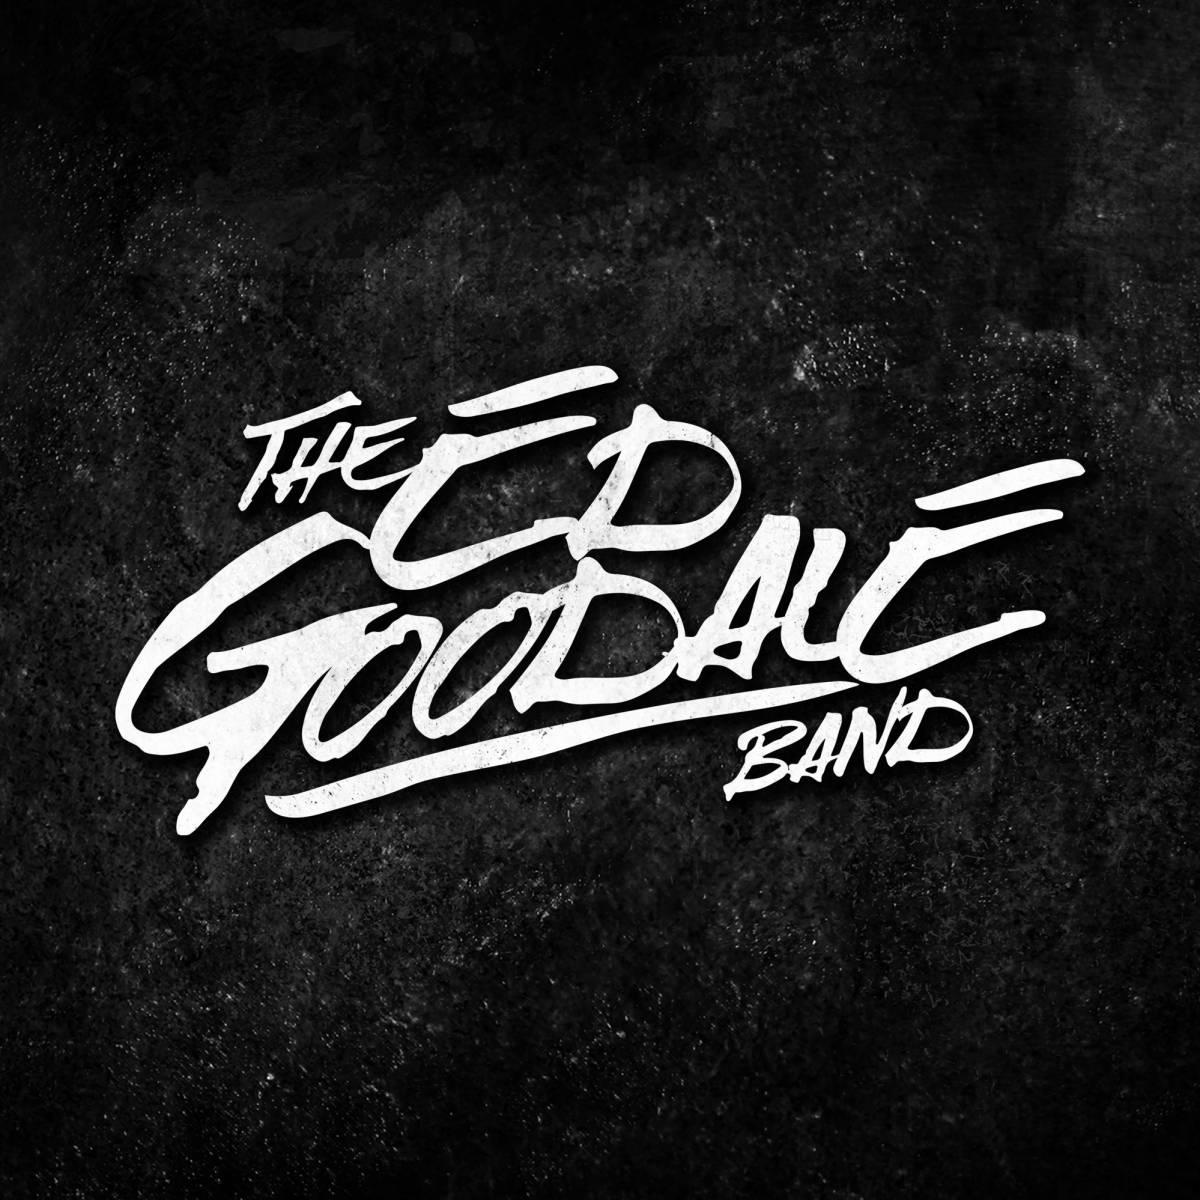 The Ed Goodale Band promo image